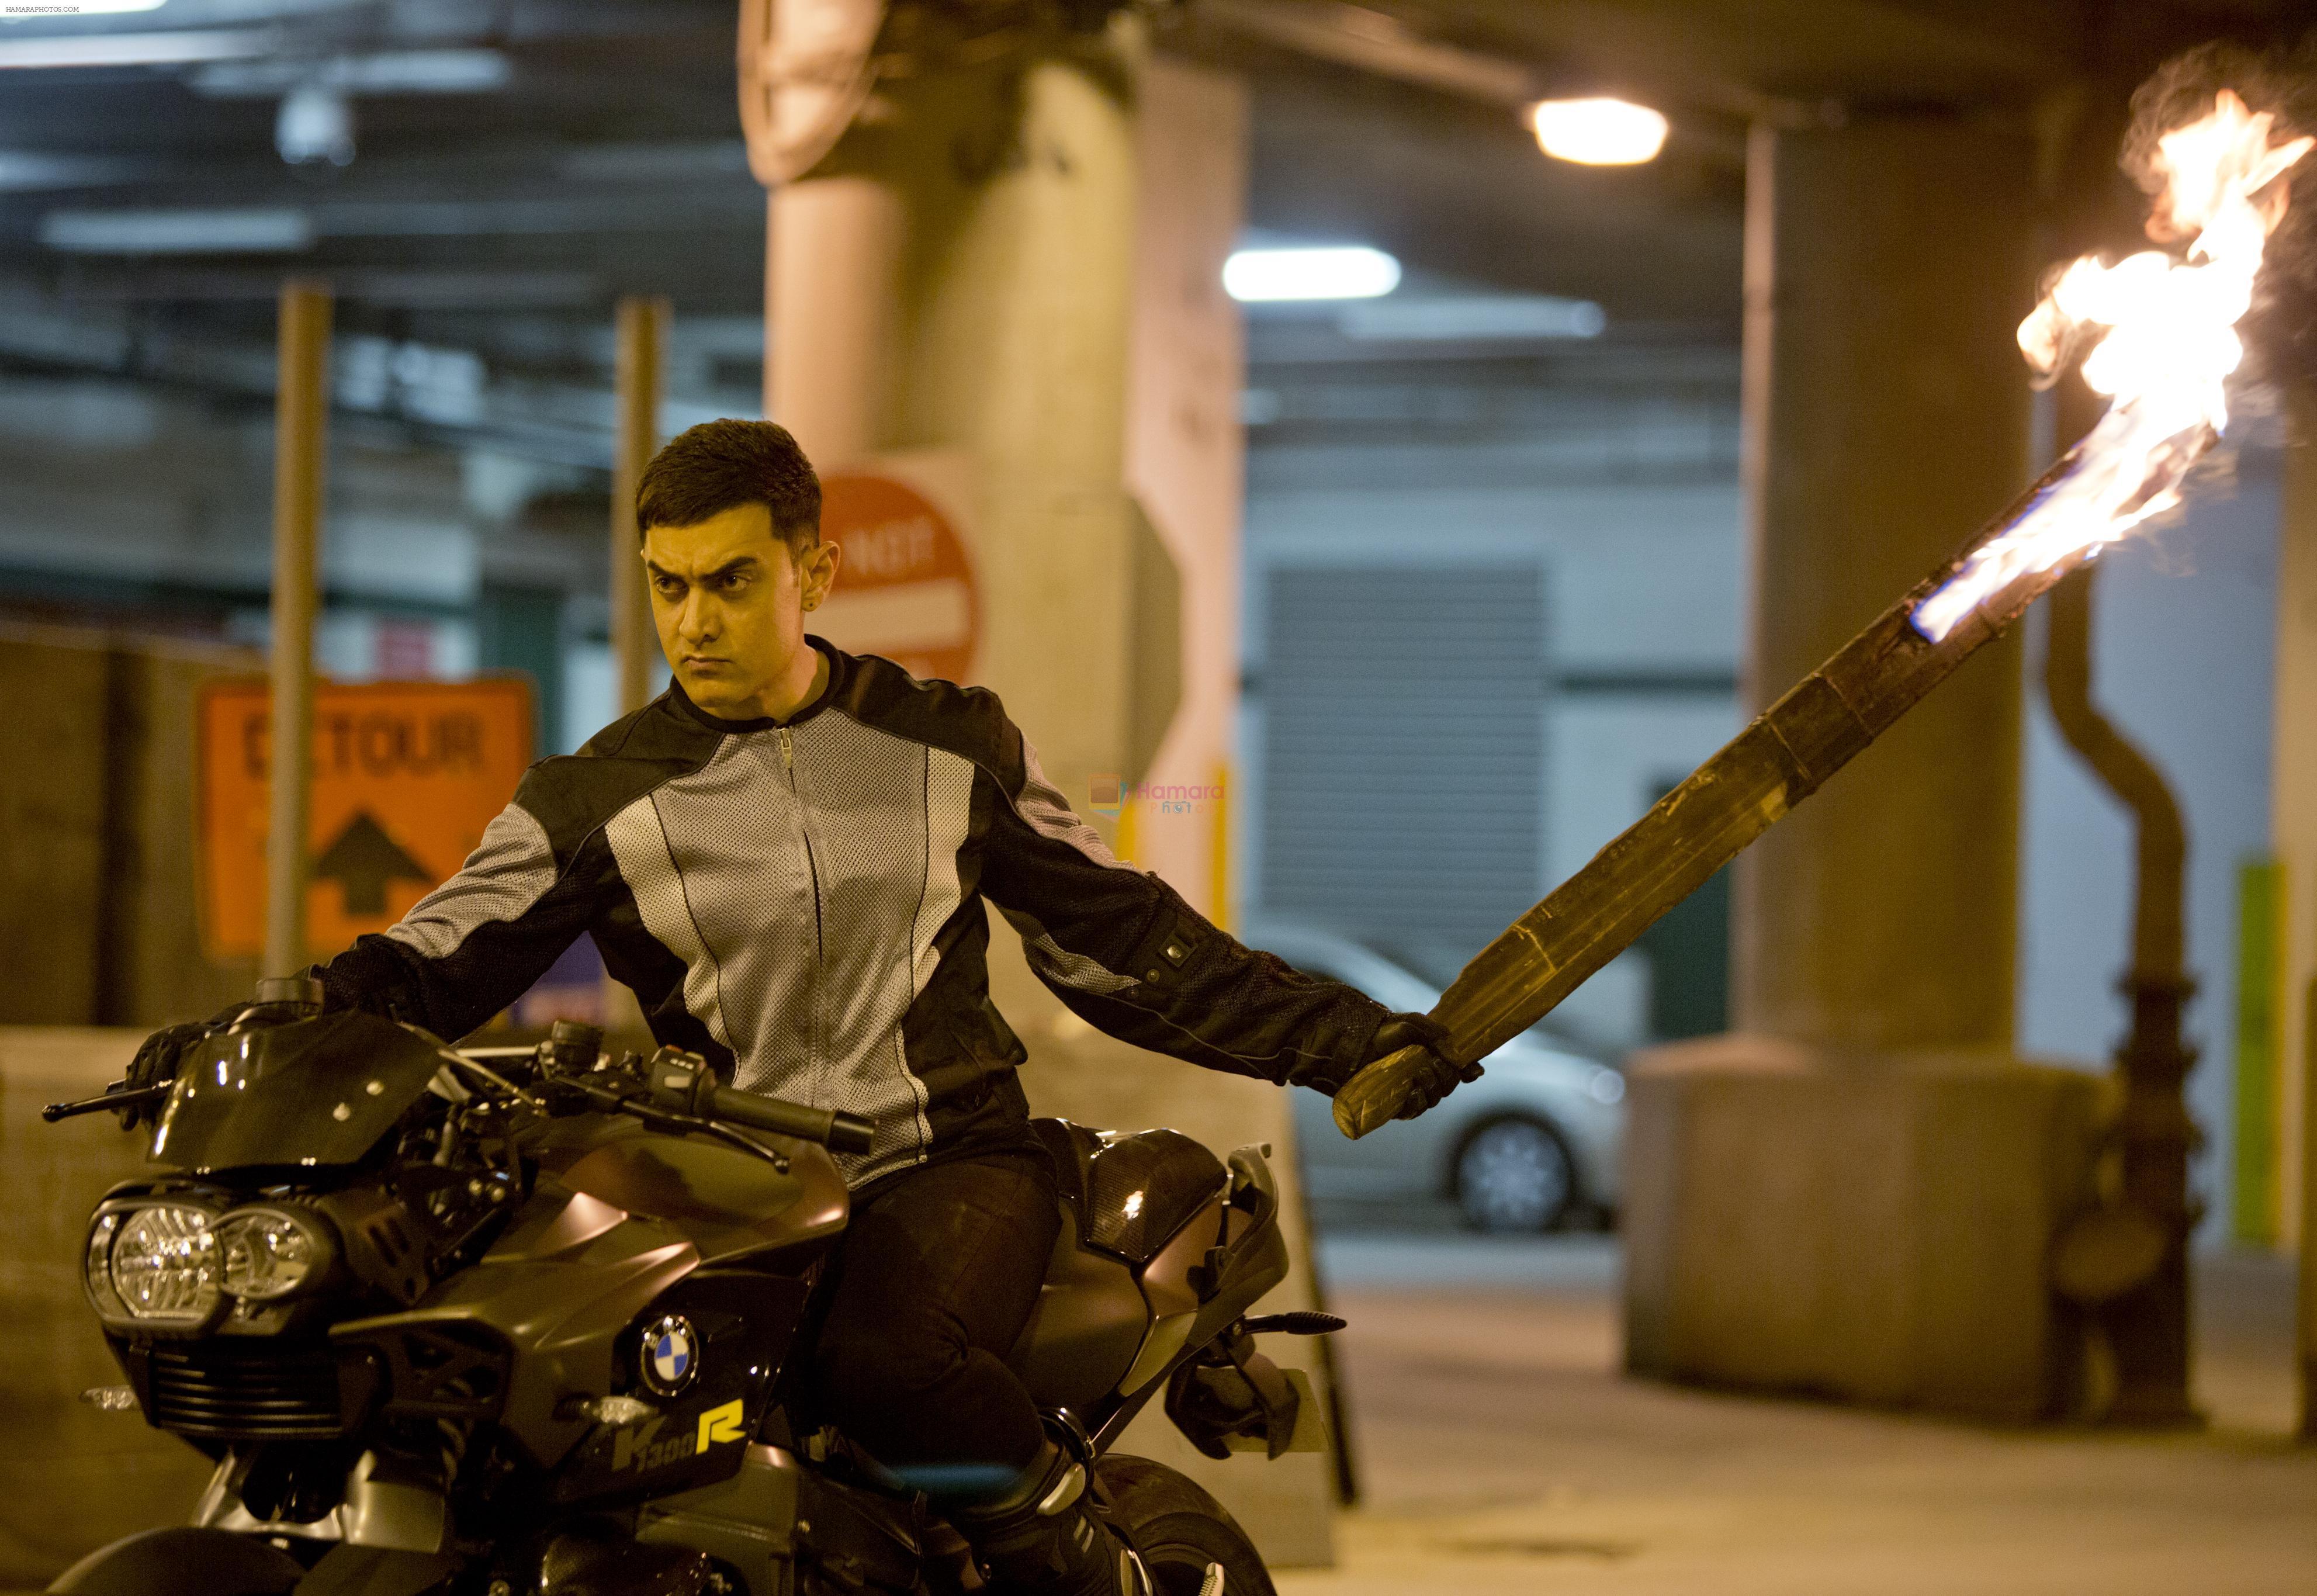 Aamir Khan Riding Stylish Bmw Bike For Dhoom3 Dhoom3 Bollywood Photos